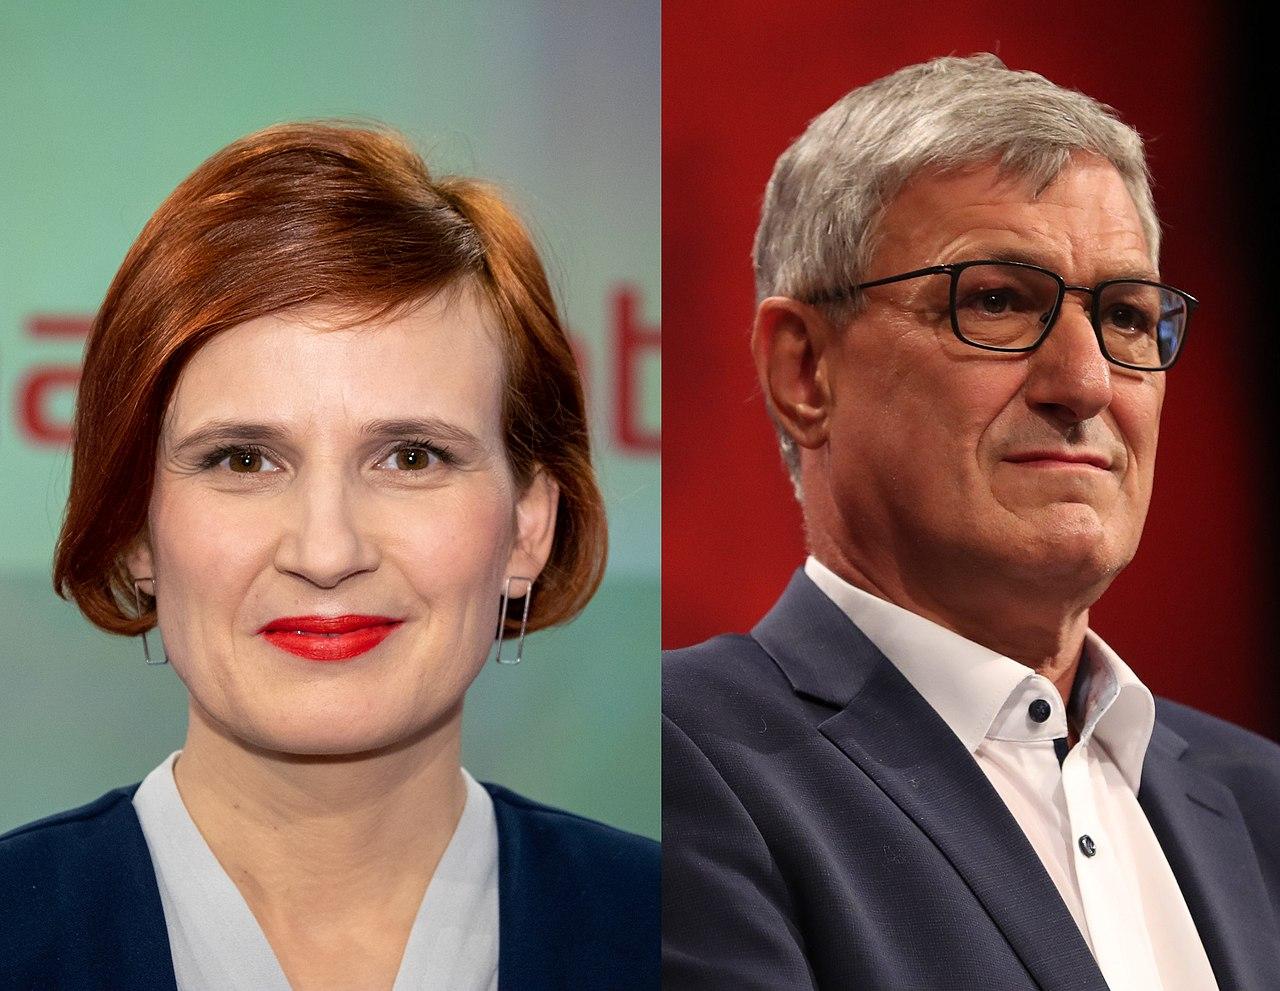 Katja Kipping et Bernd Riexinger 2019-2018.jpg